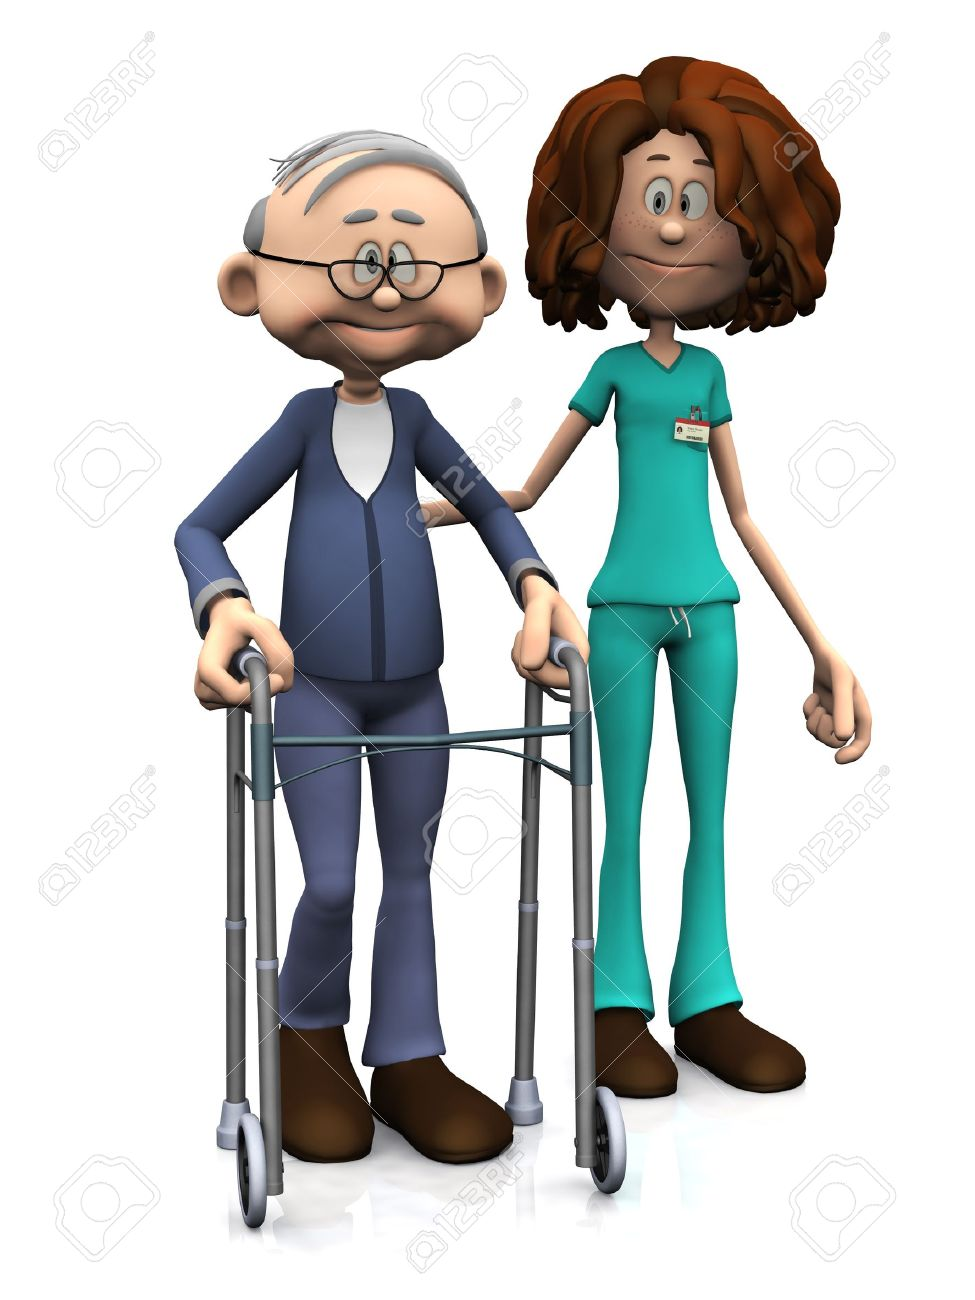 A cartoon nurse helping an elderly man with walker. White background. Stock Photo - 12323275